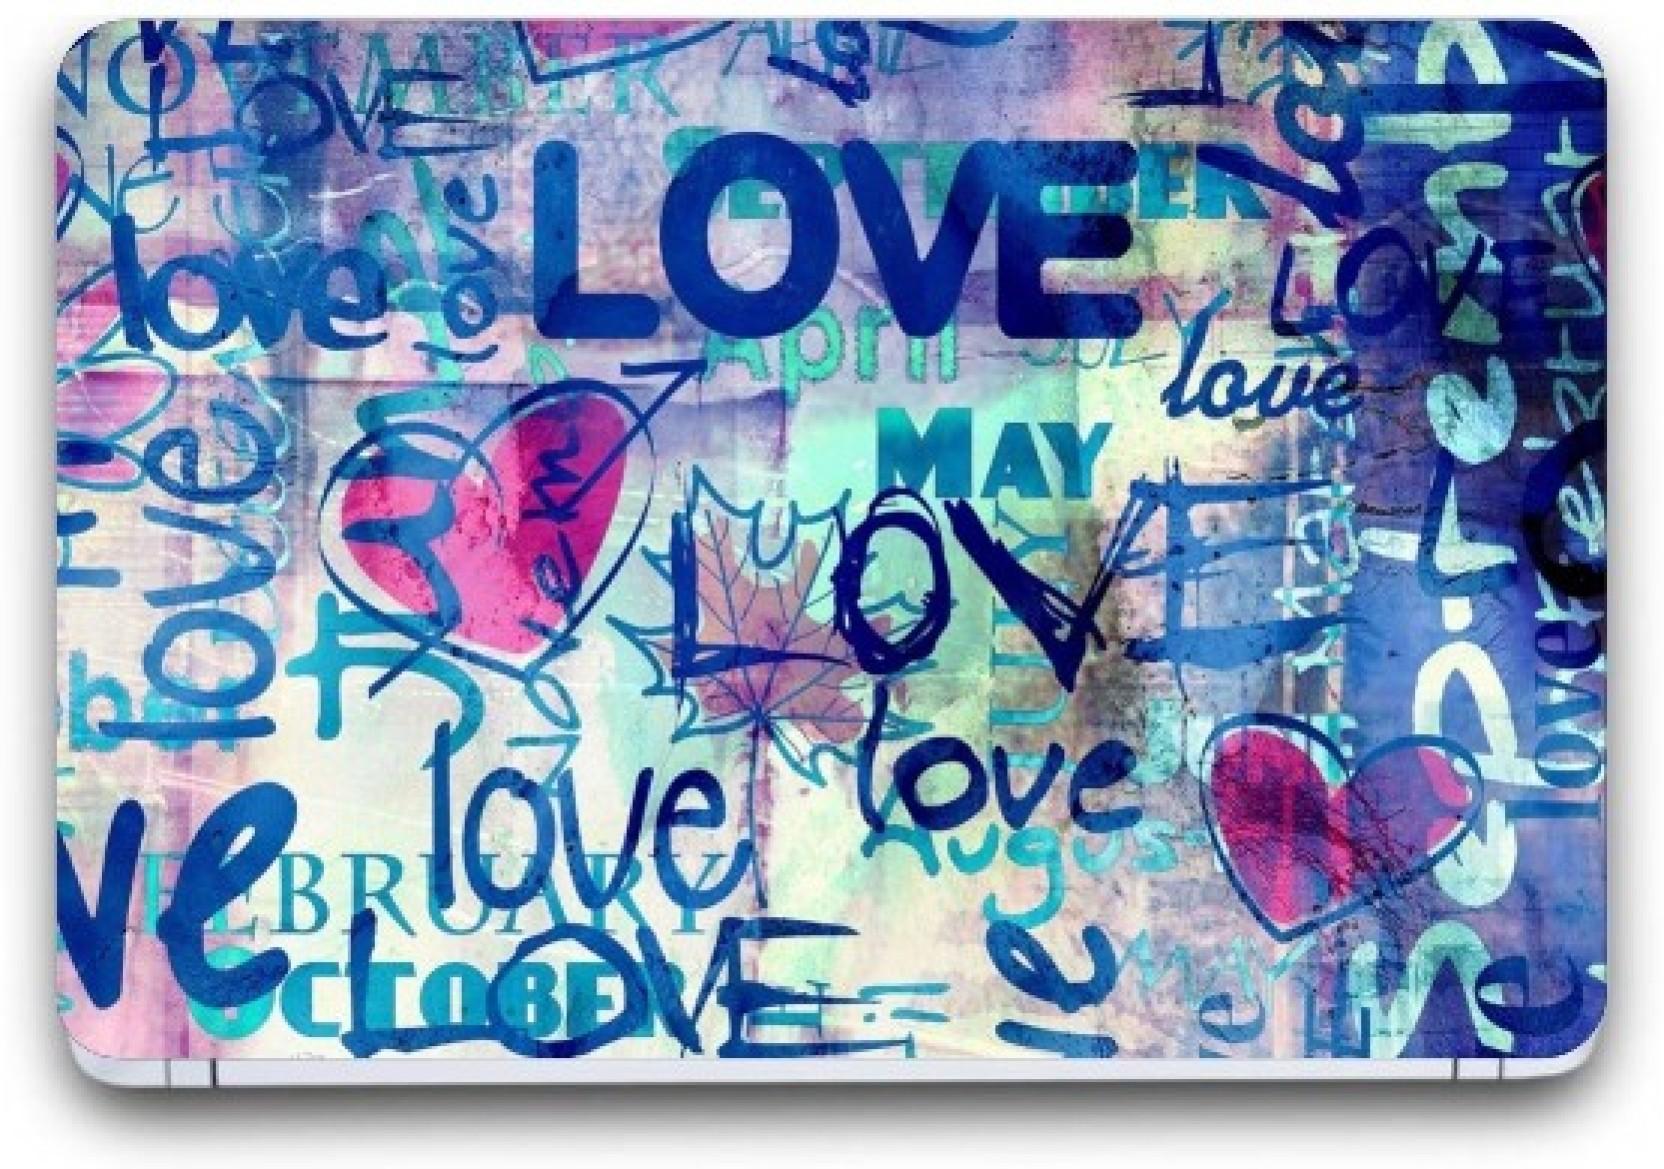 Punix Love Wallpaper Exclusive Laptop Skin Sticker Decal Wallpaper